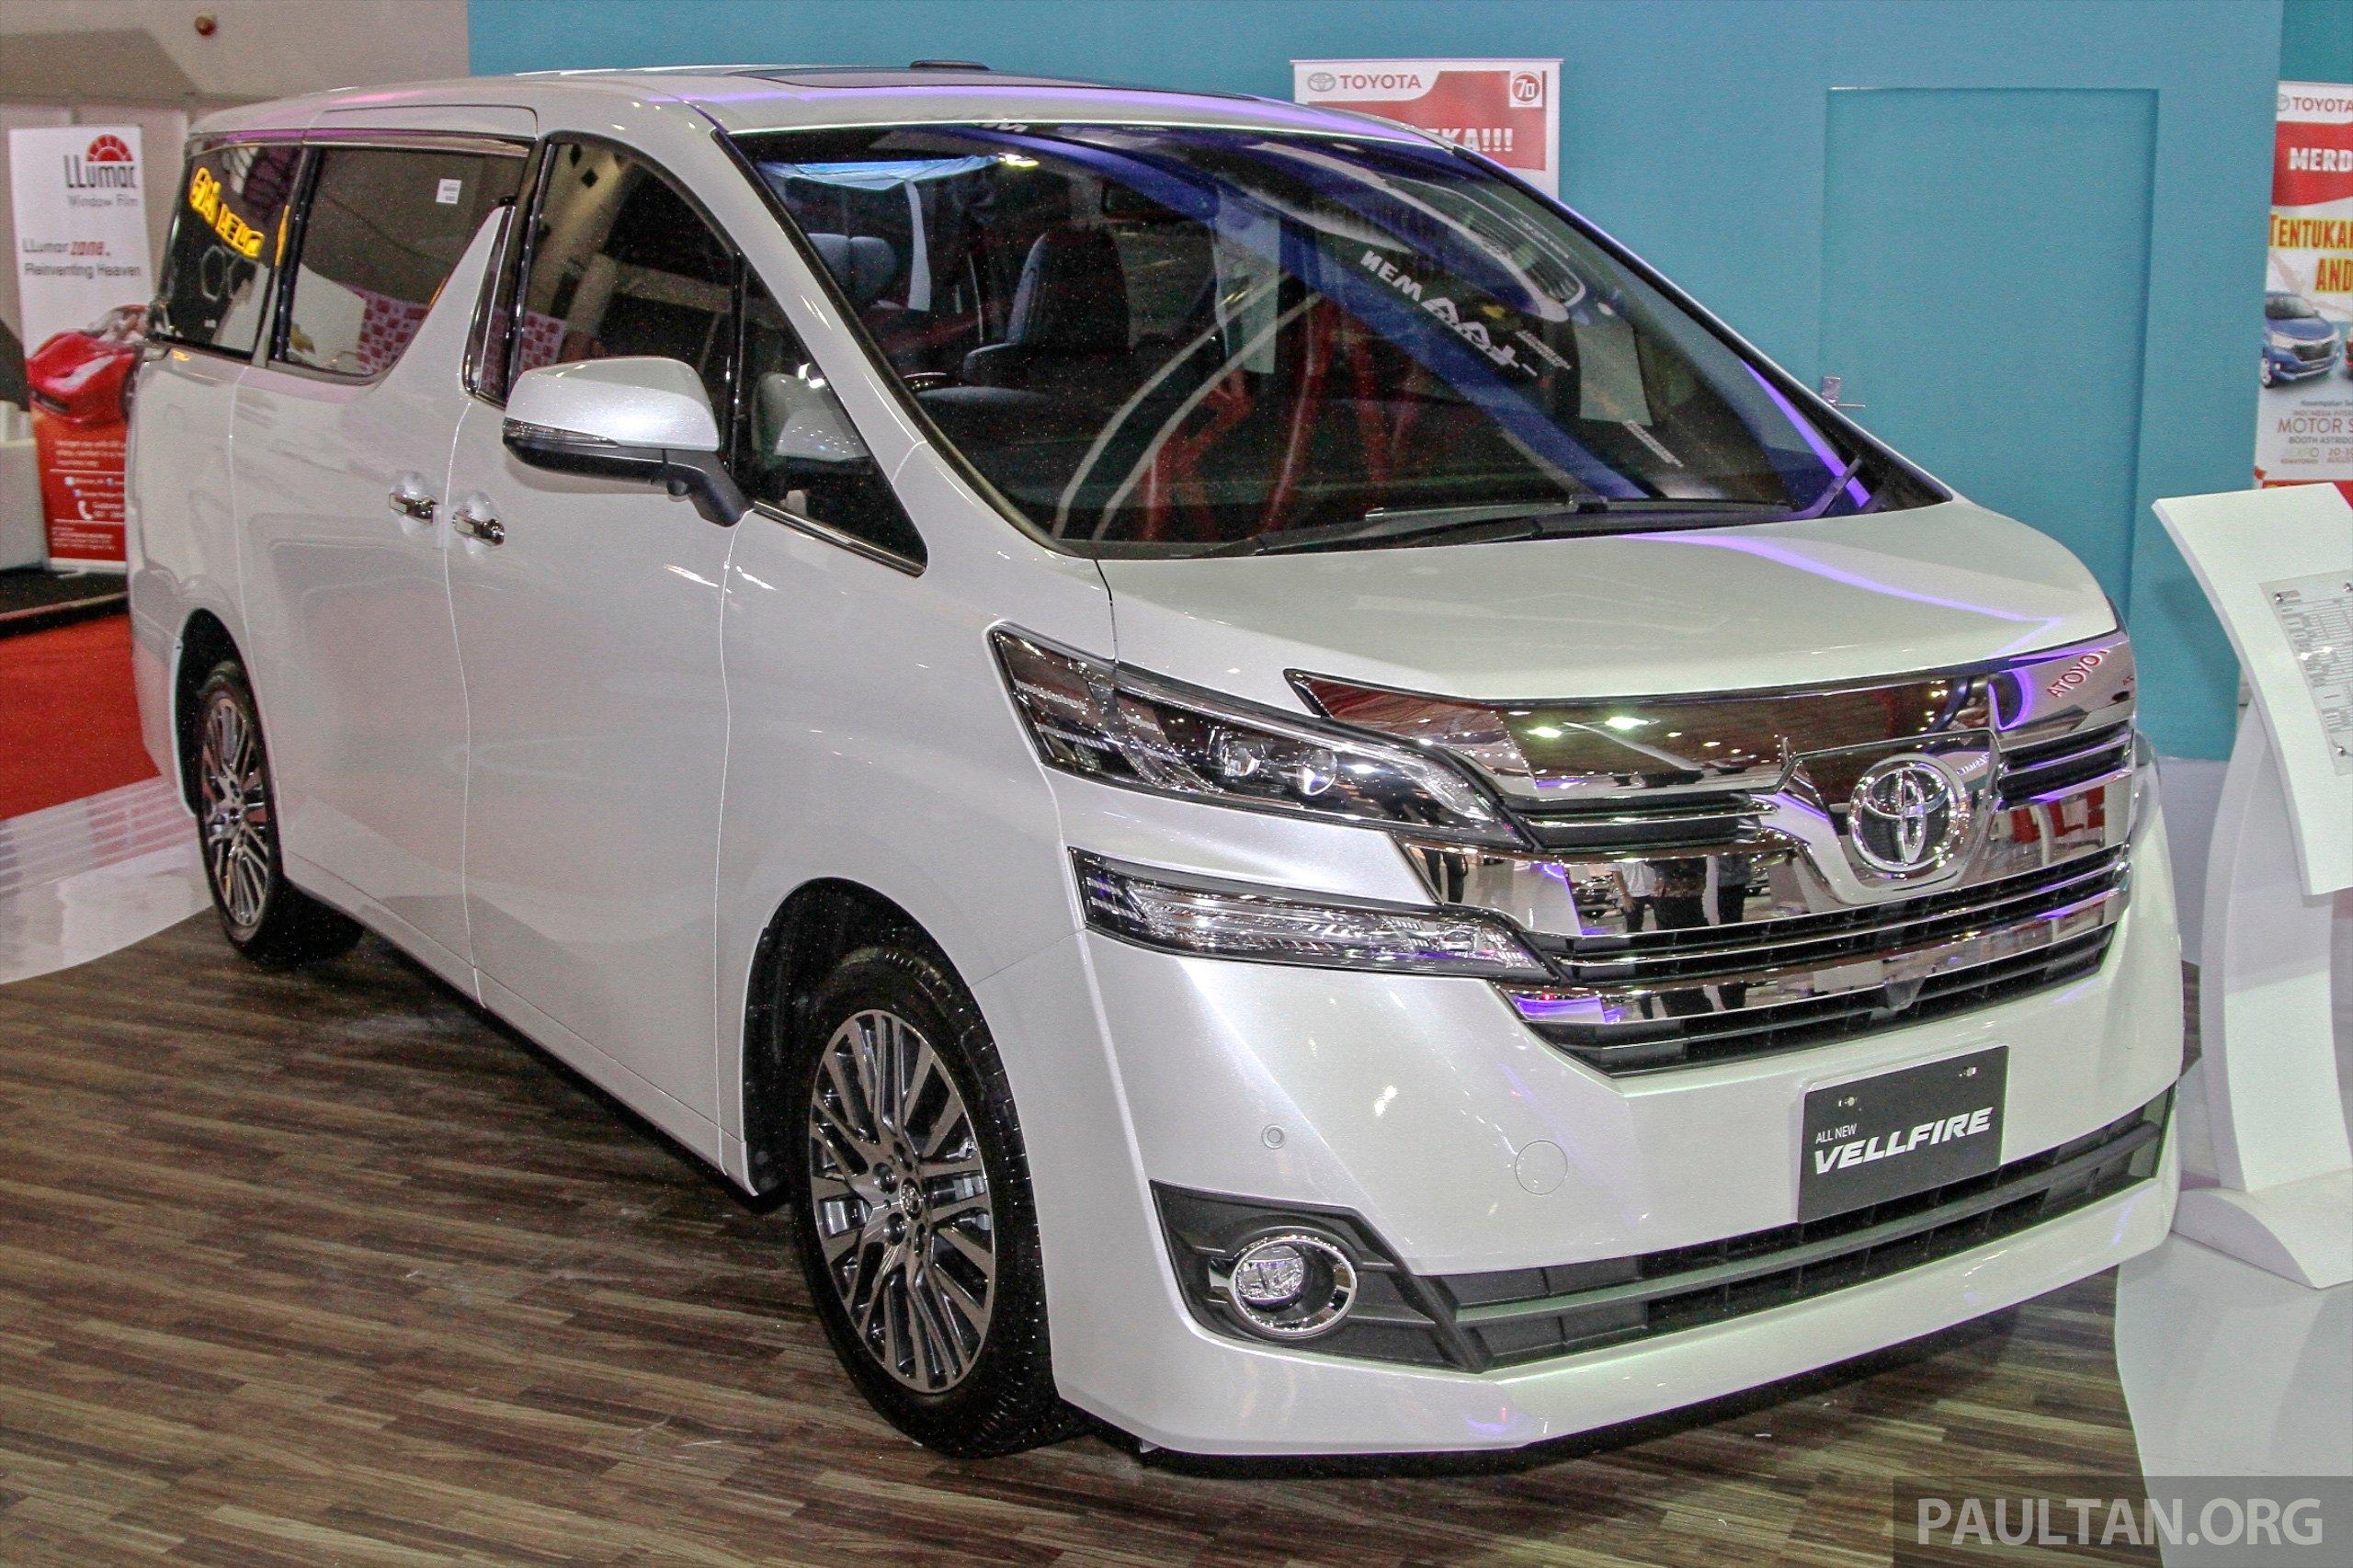 IIMS 2015: Toyota Vellfire Appears